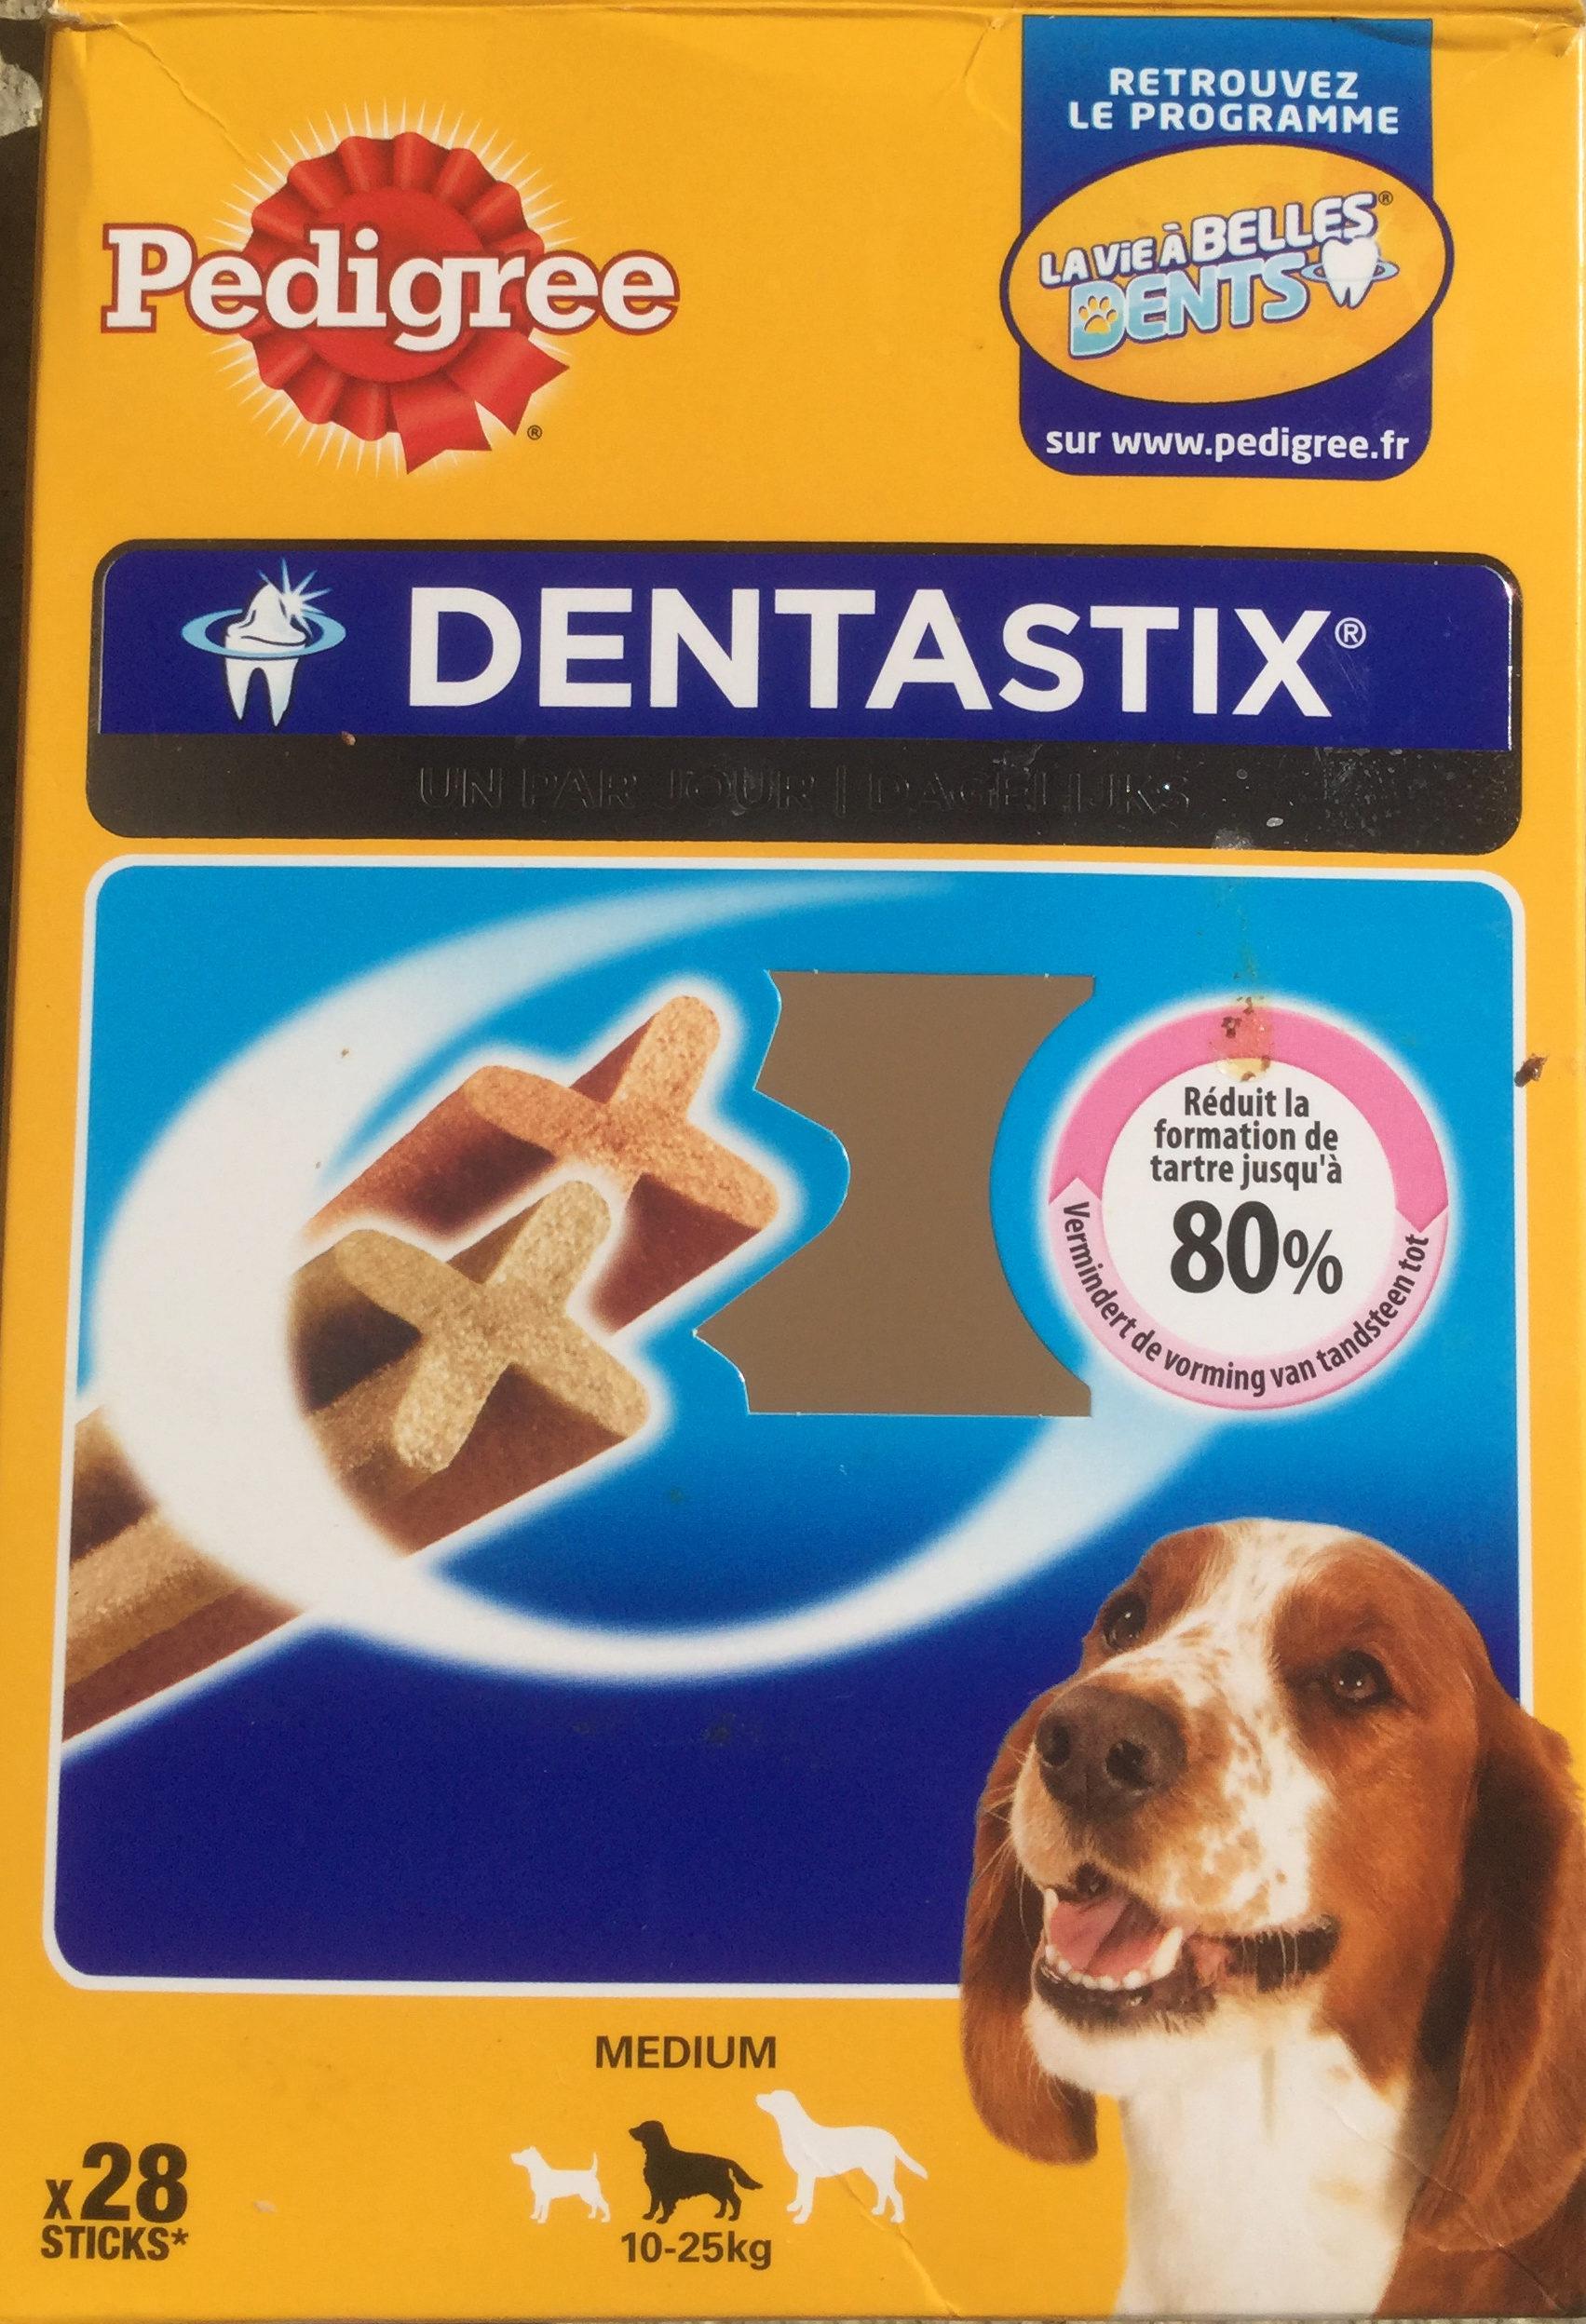 Dentastix - Product